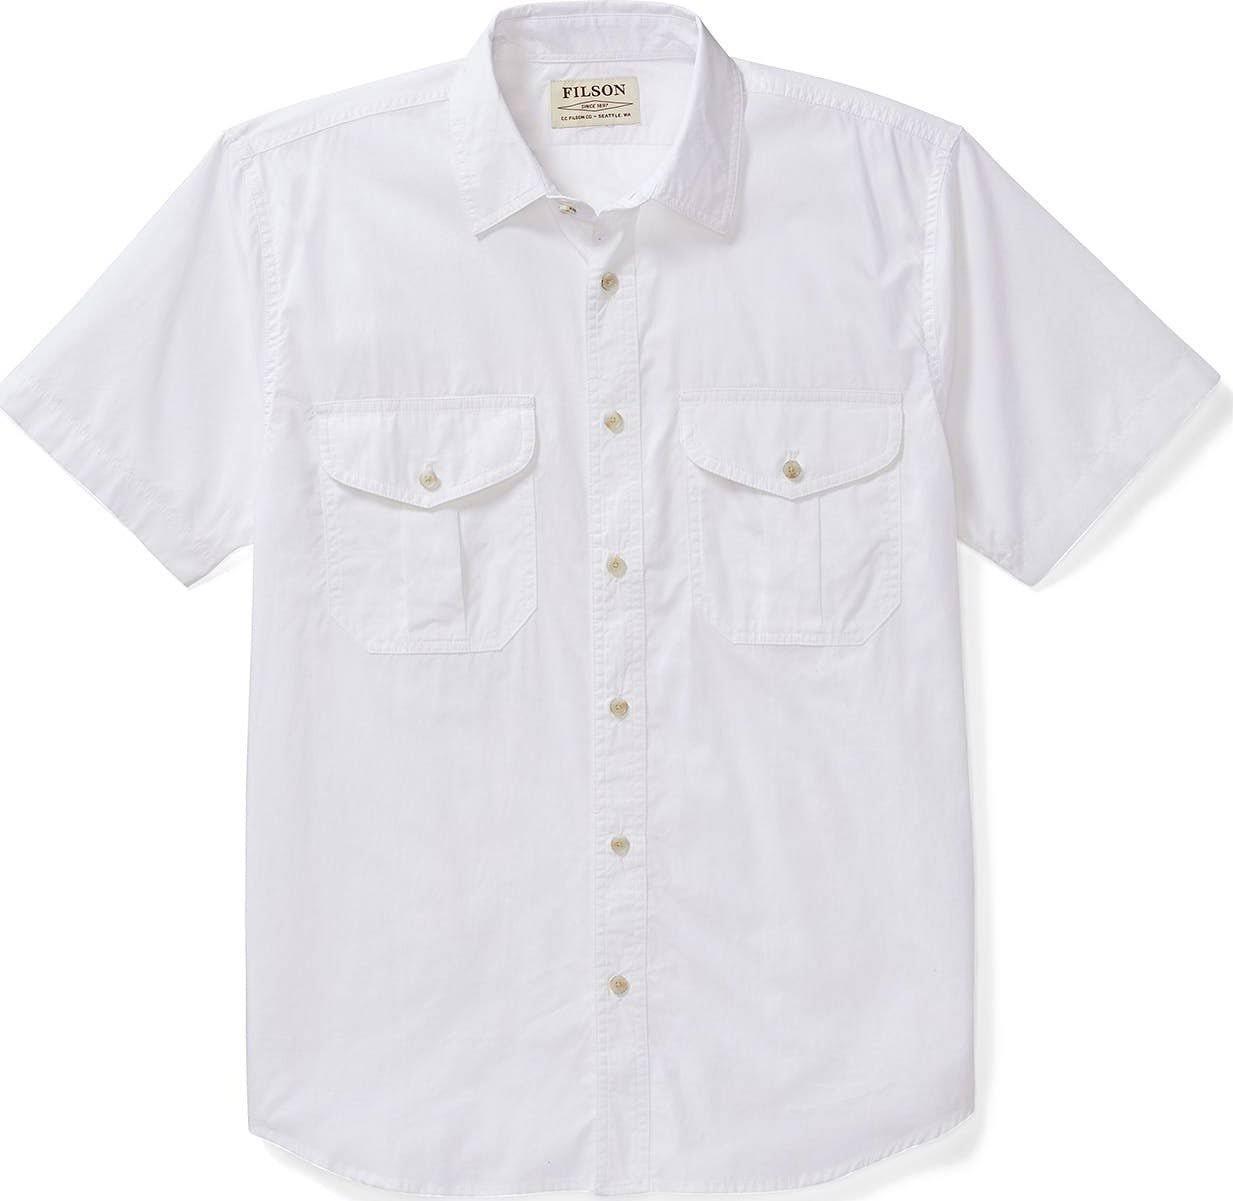 De Tela Manga Para Camisa Blanco M Corta Plumas En Hombres Filson da5wUwqnF